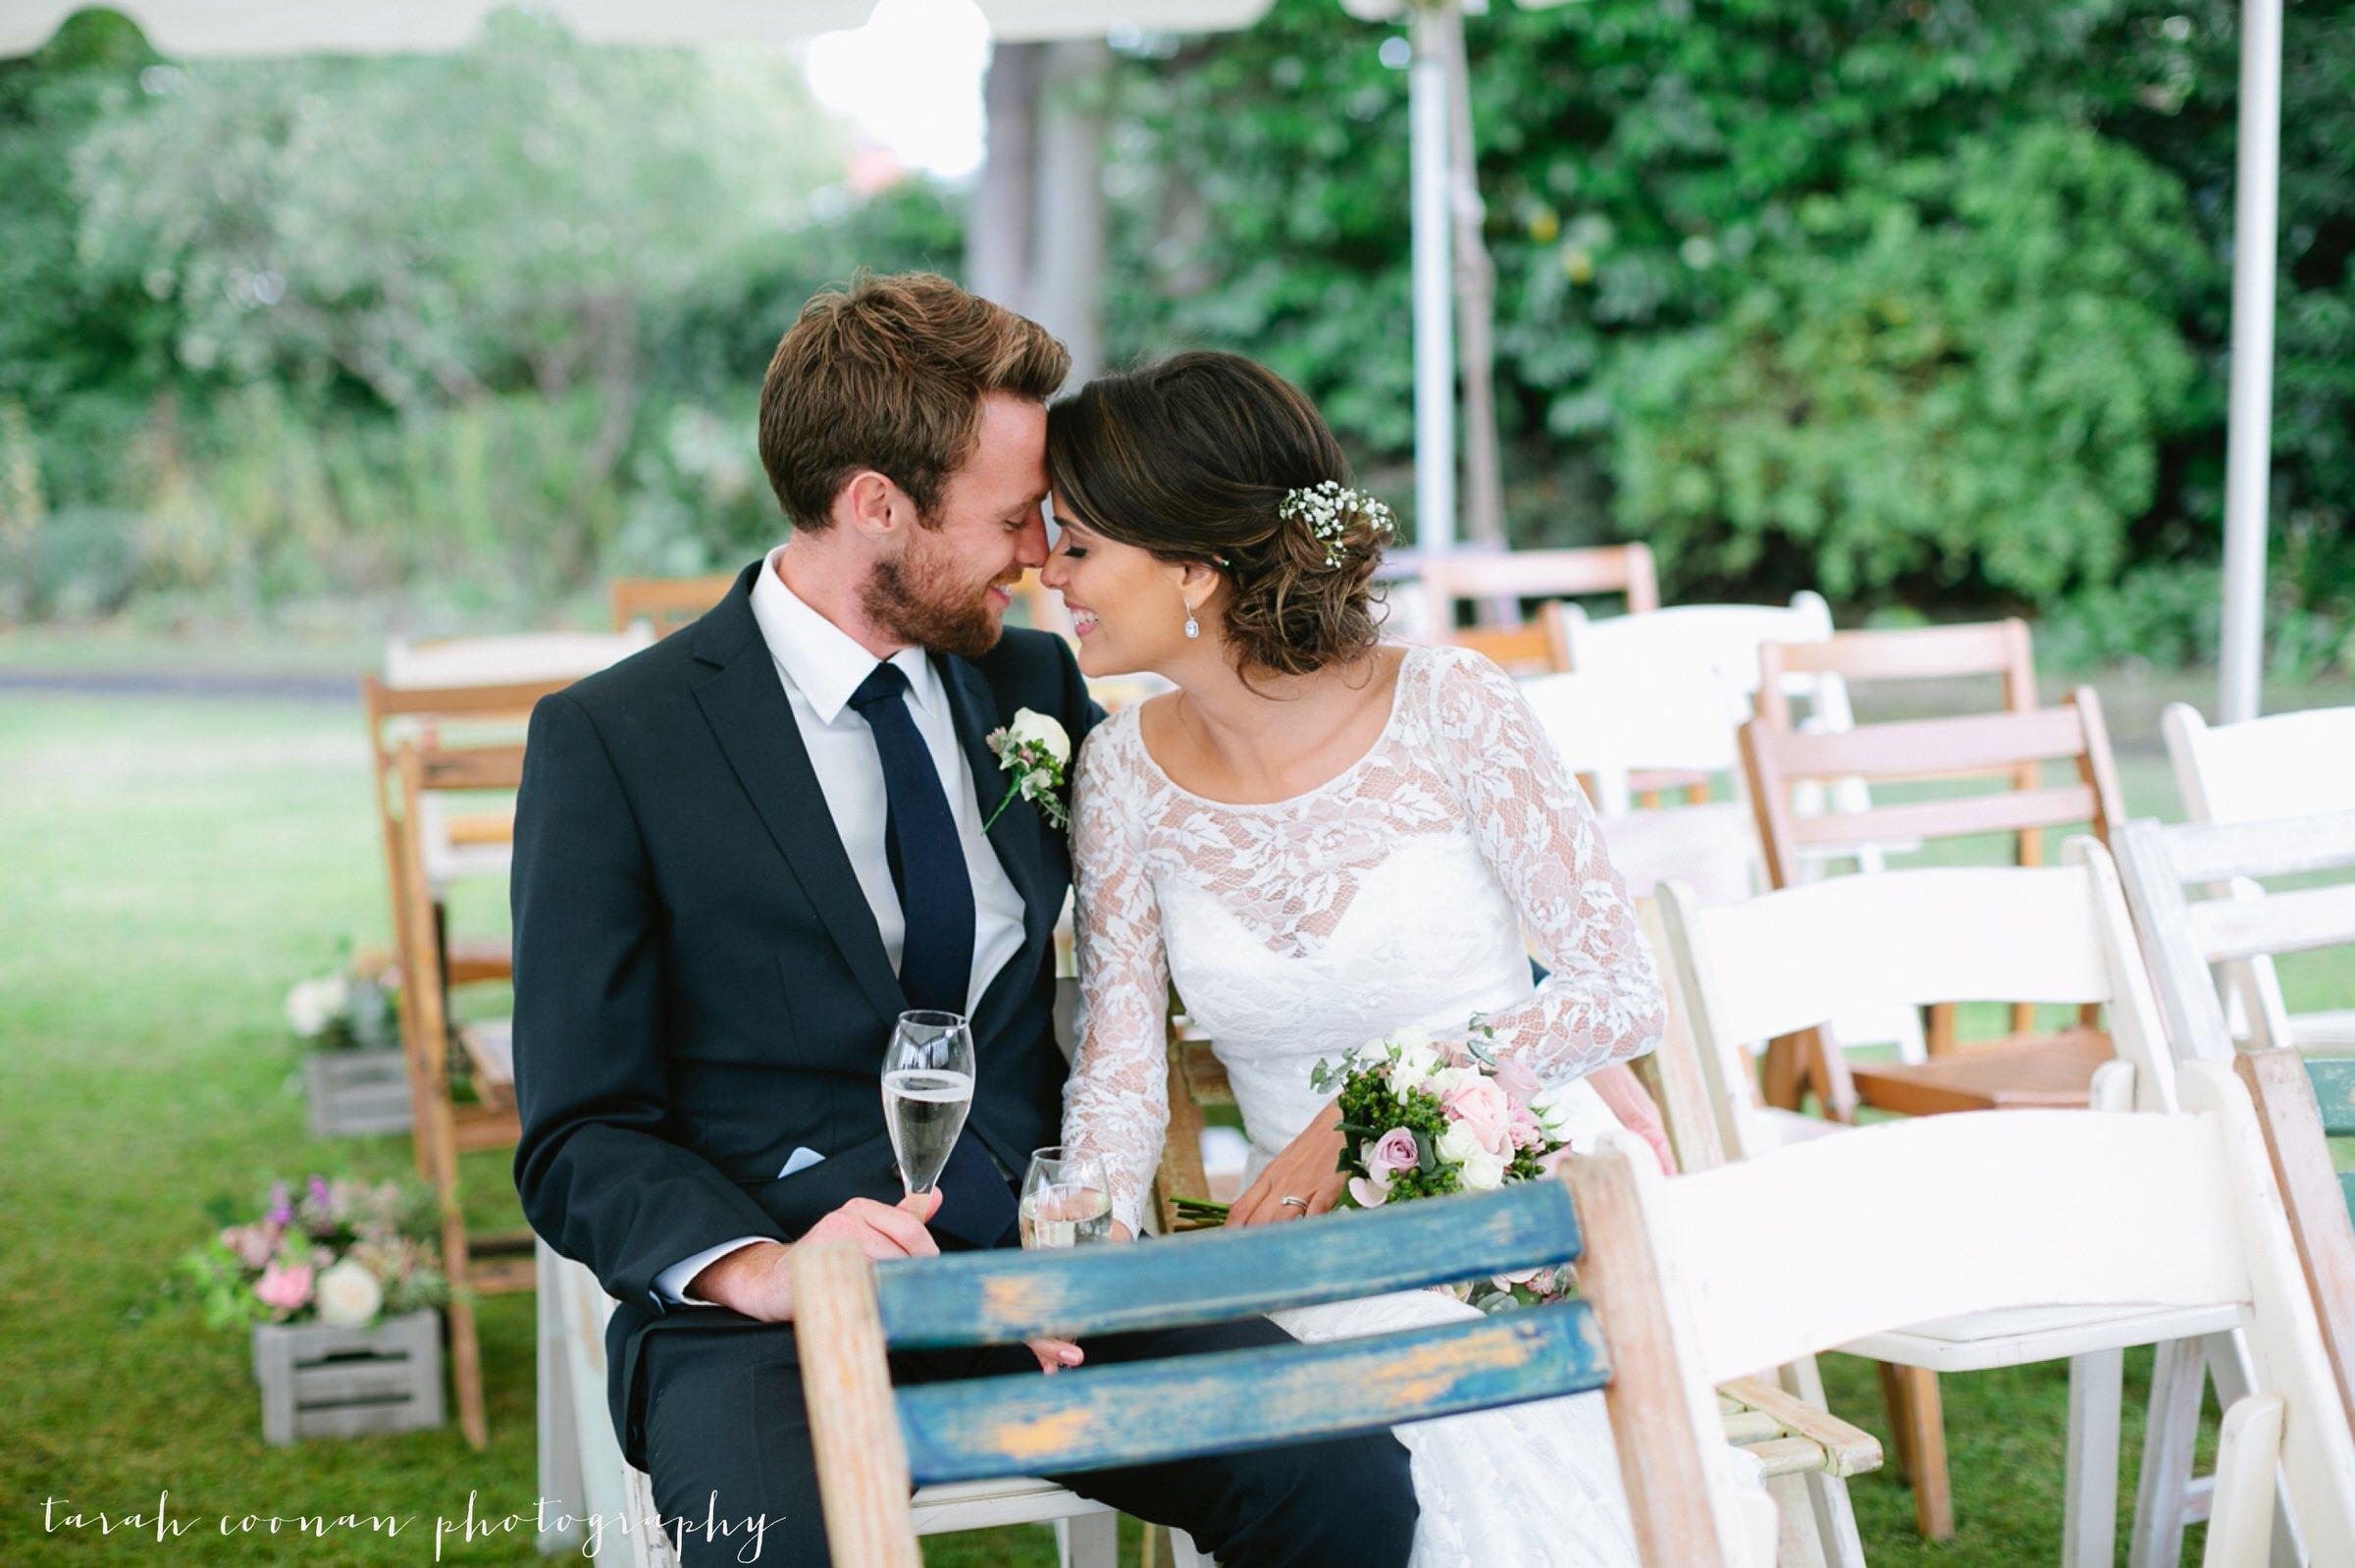 brighton-wedding-photographer67